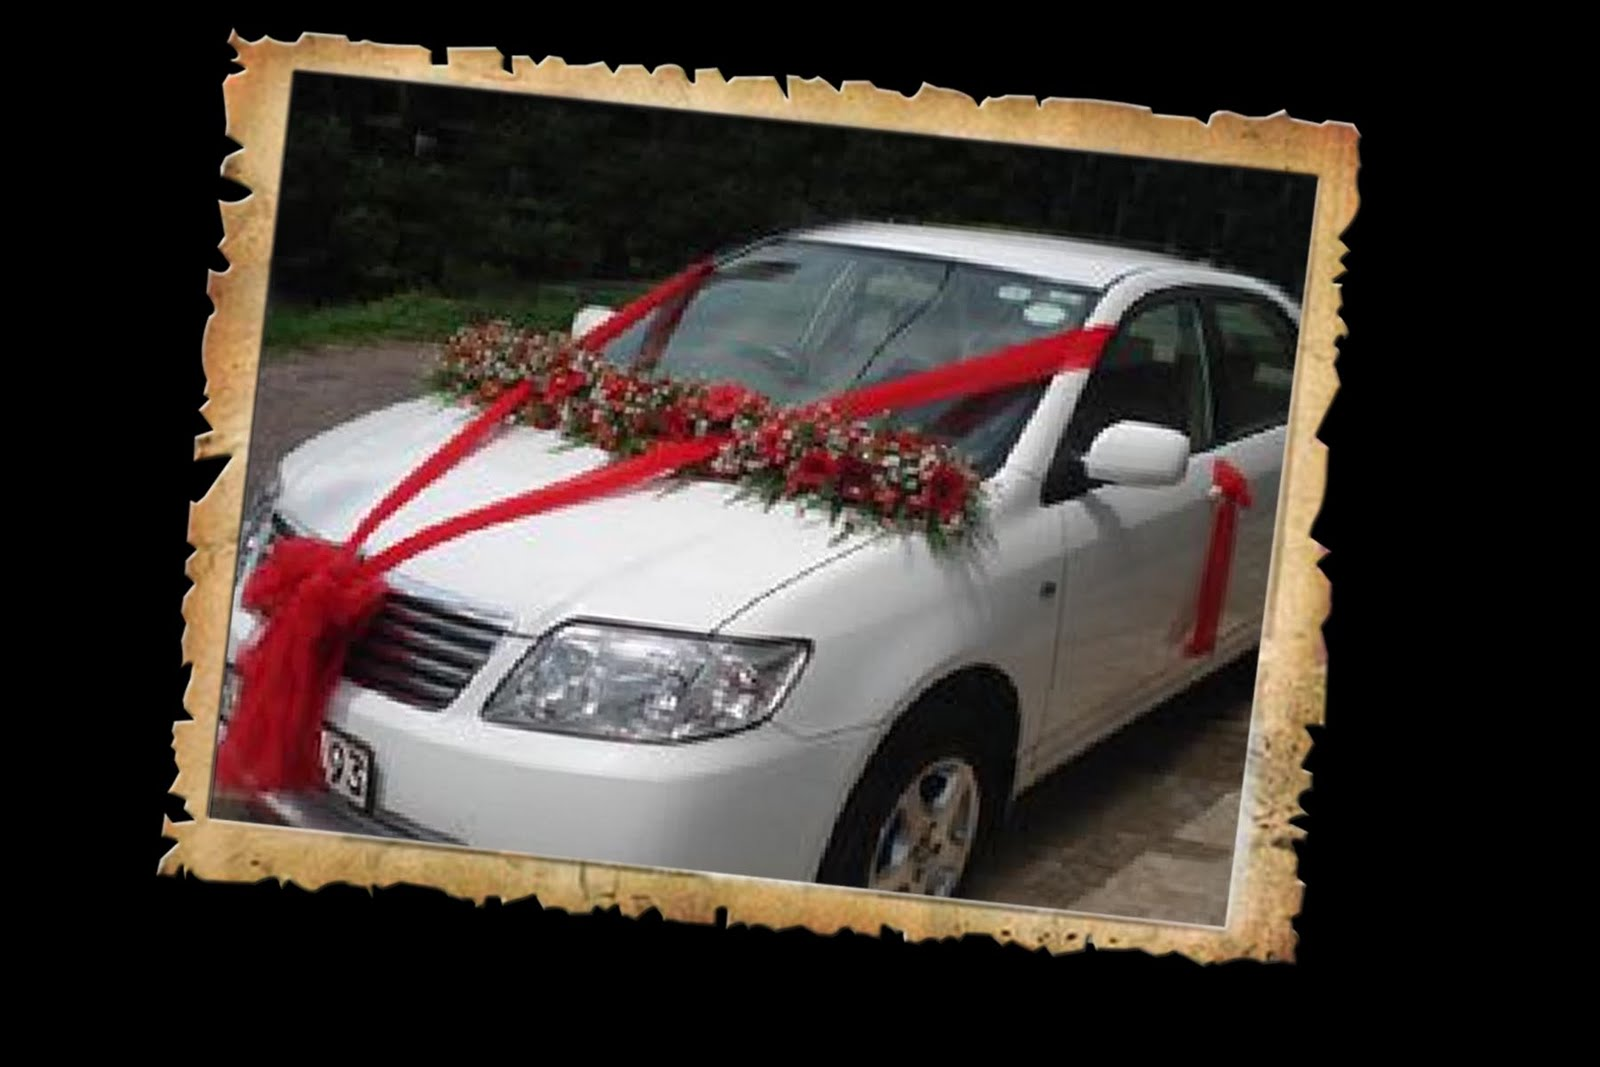 Wedding Snaps: Car DecorationWedding Snaps